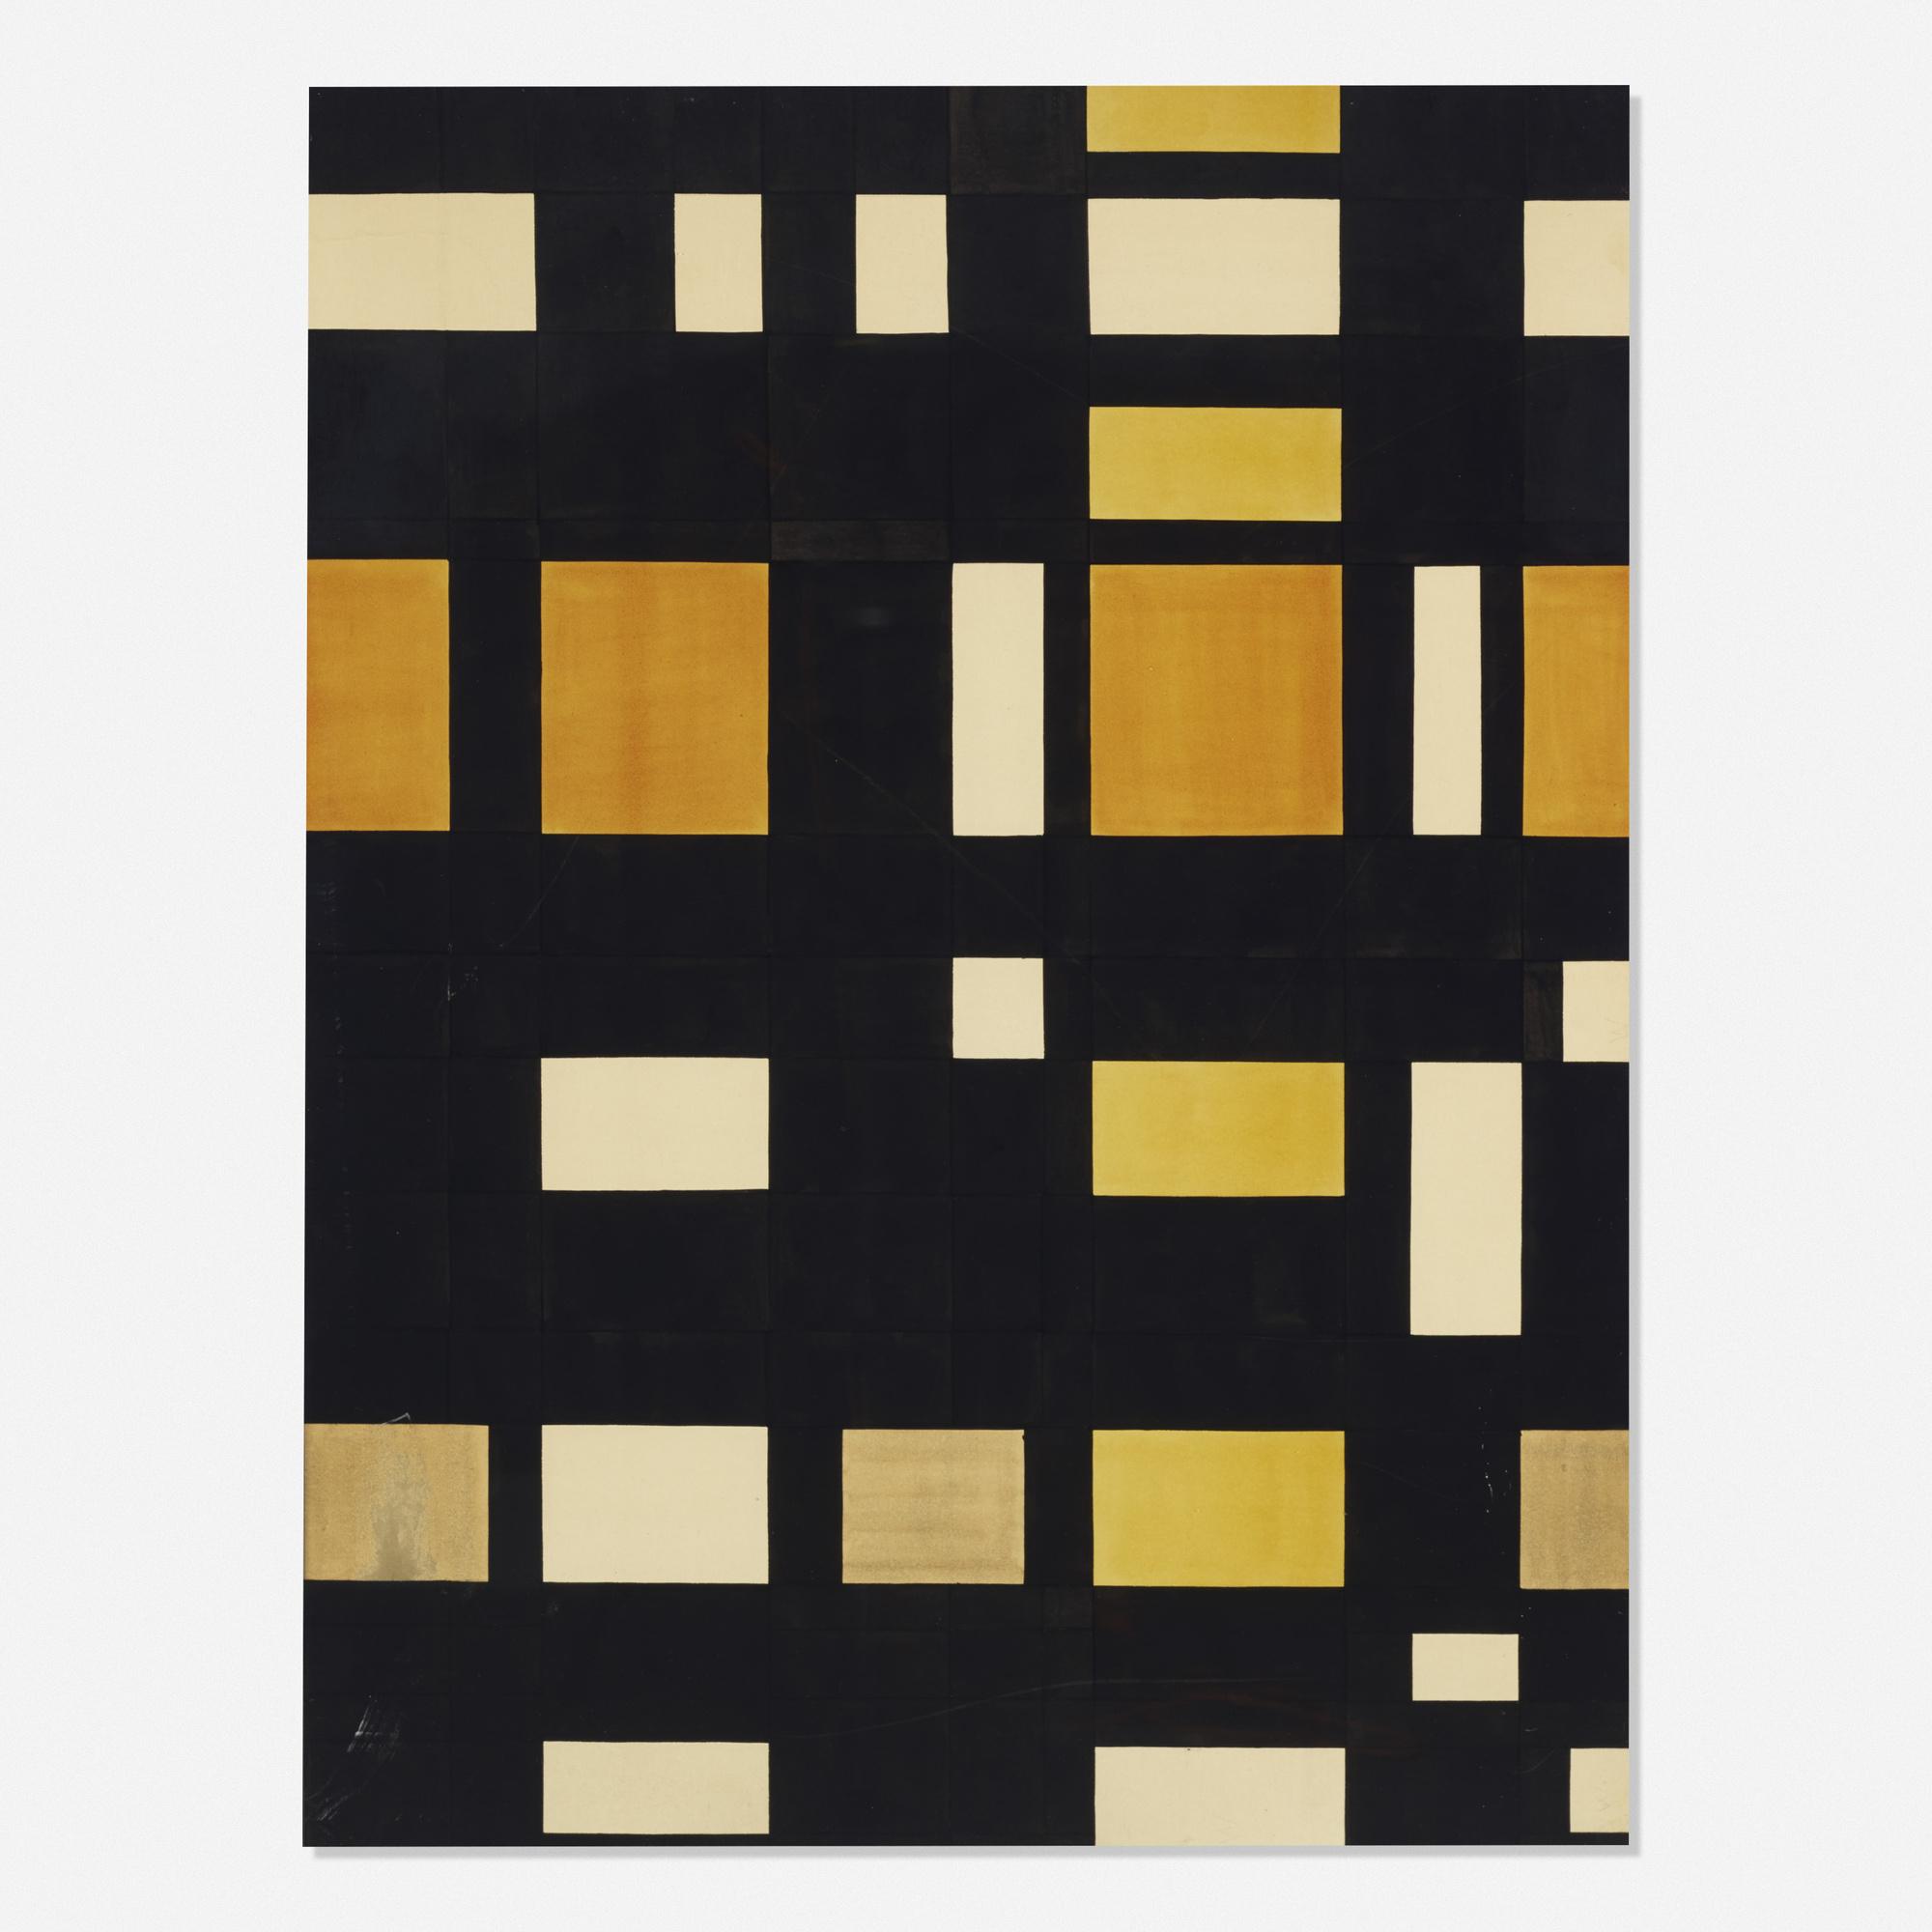 134: Angelo Testa / Untitled (1 of 1)